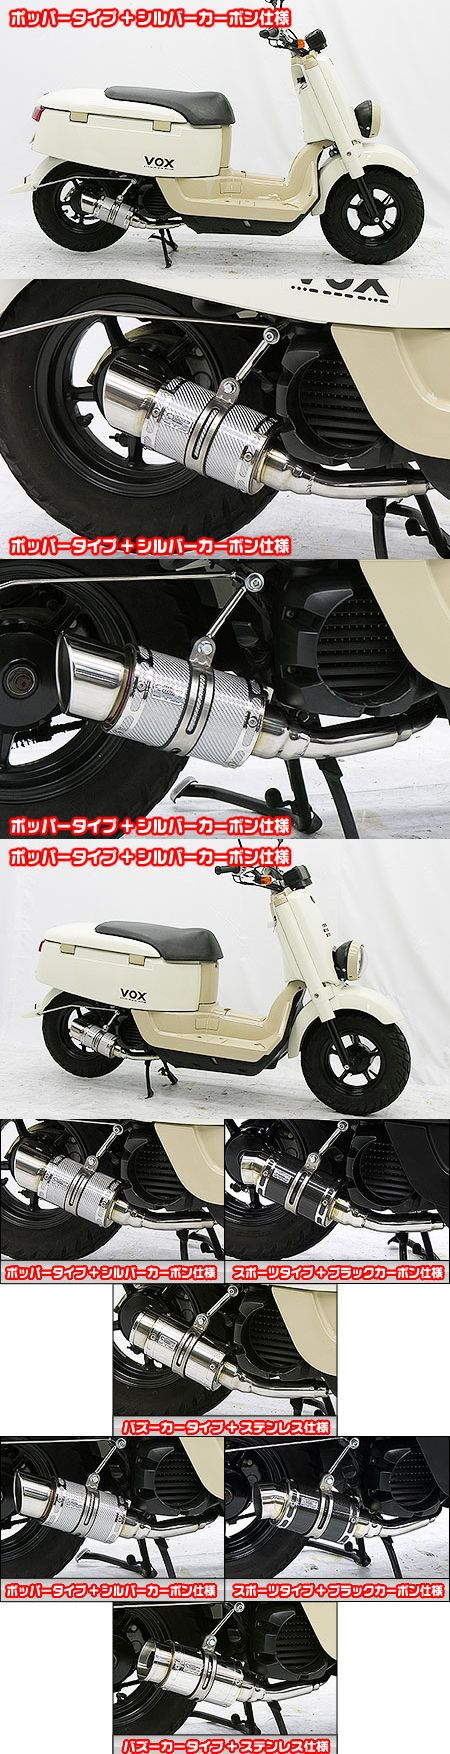 Tiger auto聯名款 Fat Bomber全段排氣管 Popper型 銀色碳纖維款式